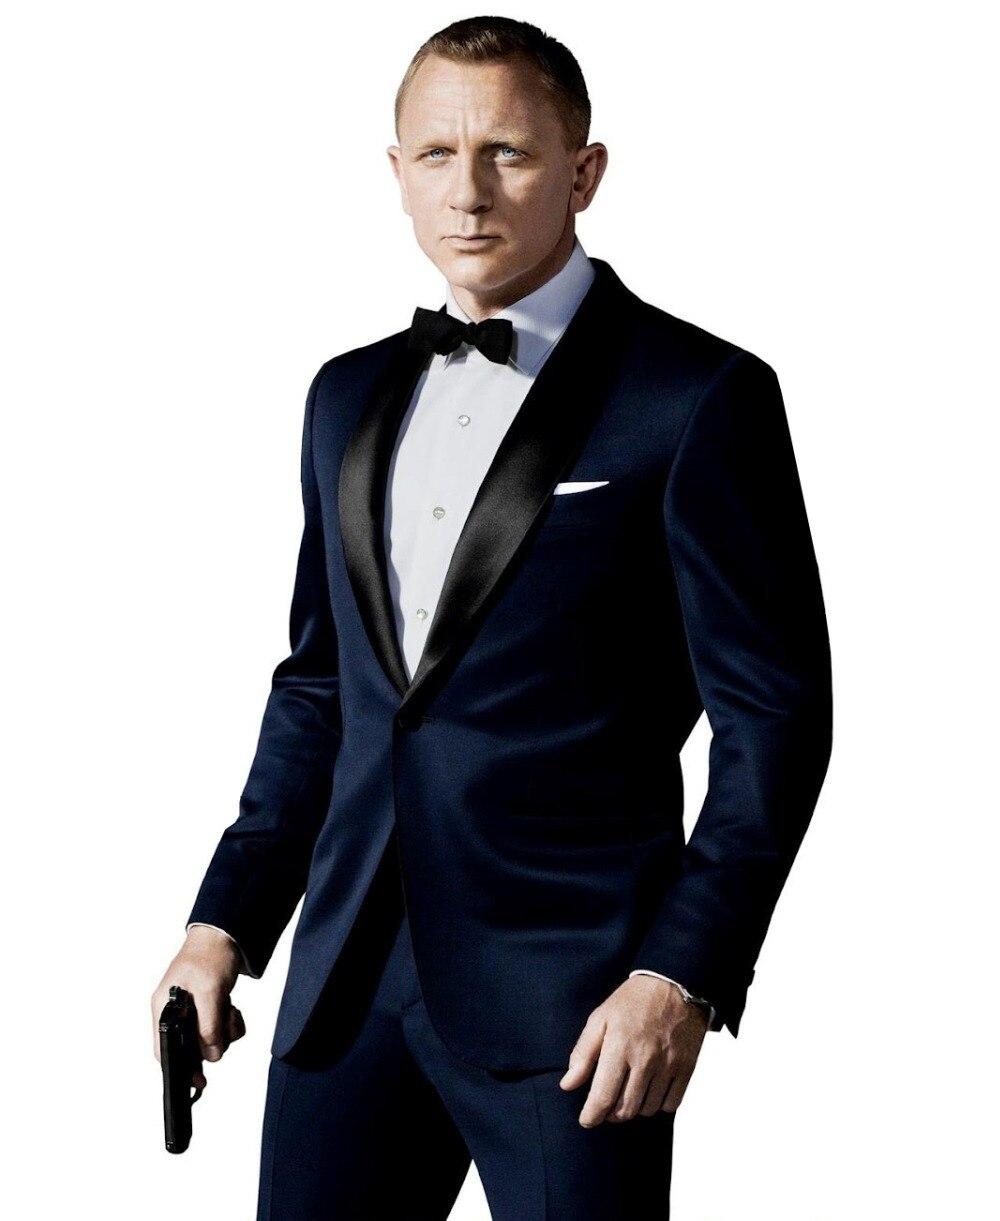 Wedding Mens Wedding Tuxedos aliexpress com buy colours wear grey suit grooms wedding tuxedos 3675 2